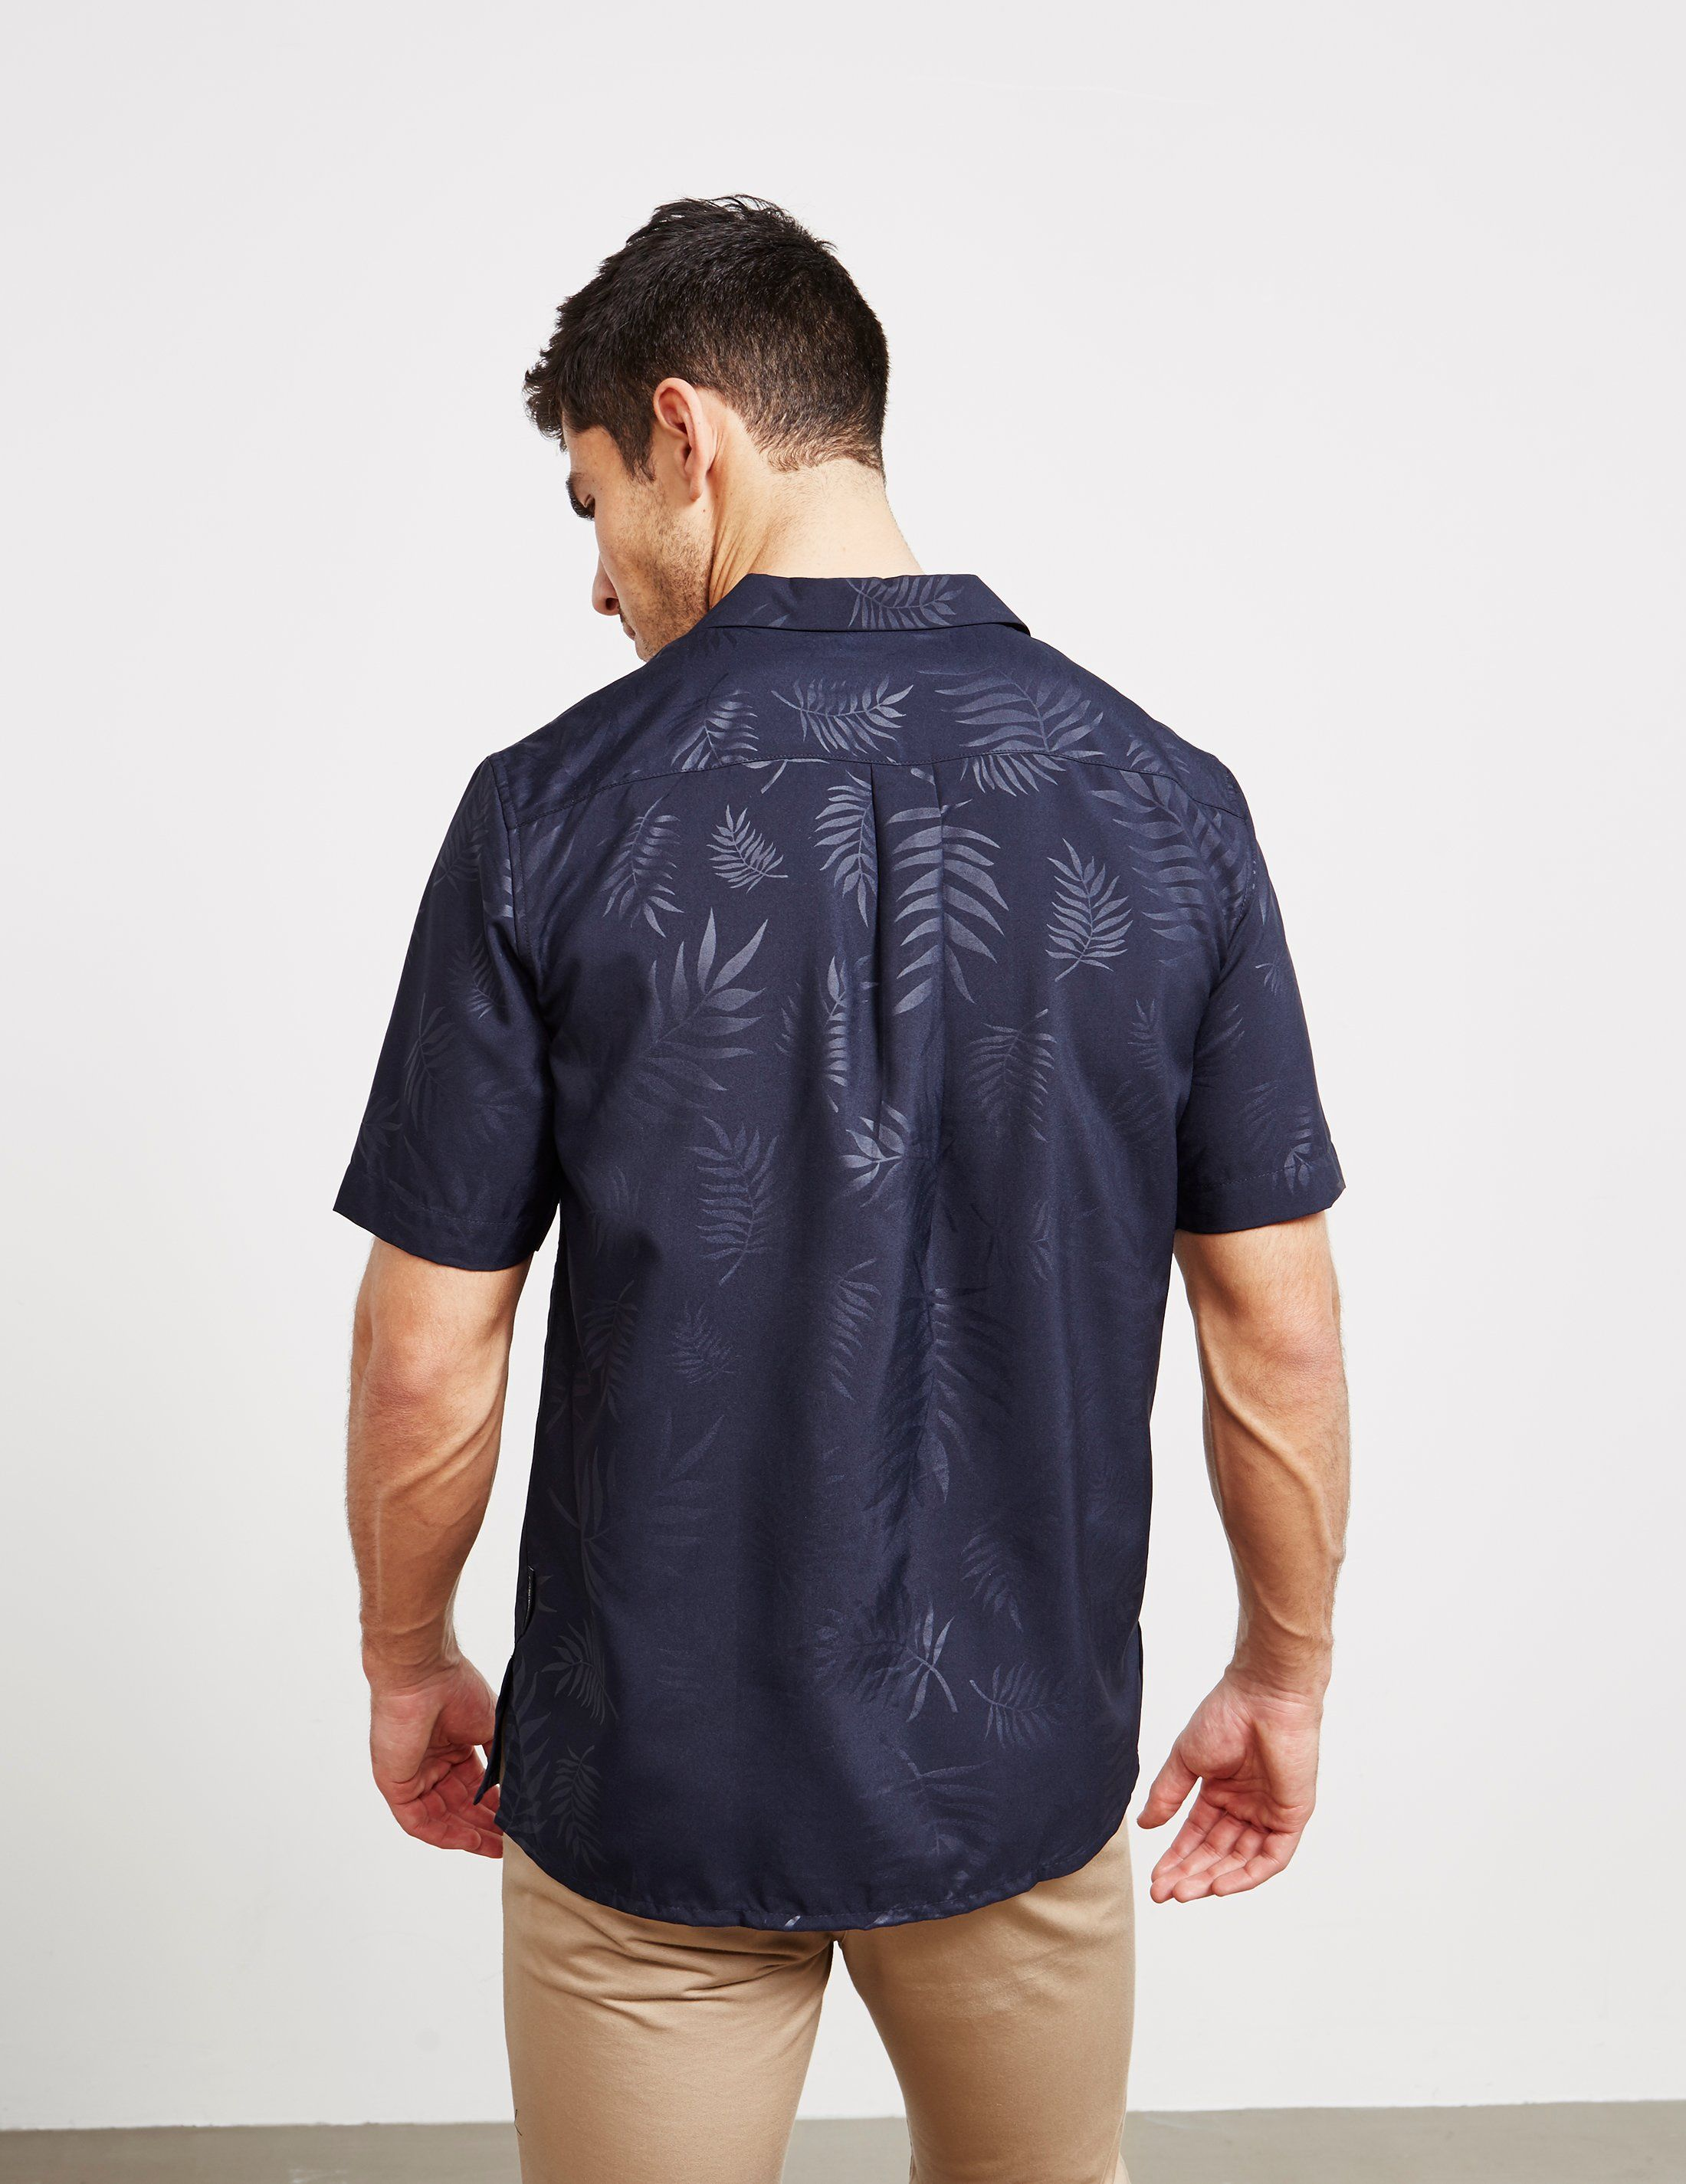 Emporio Armani Palm Print Short Sleeve Shirt - Online Exclusive